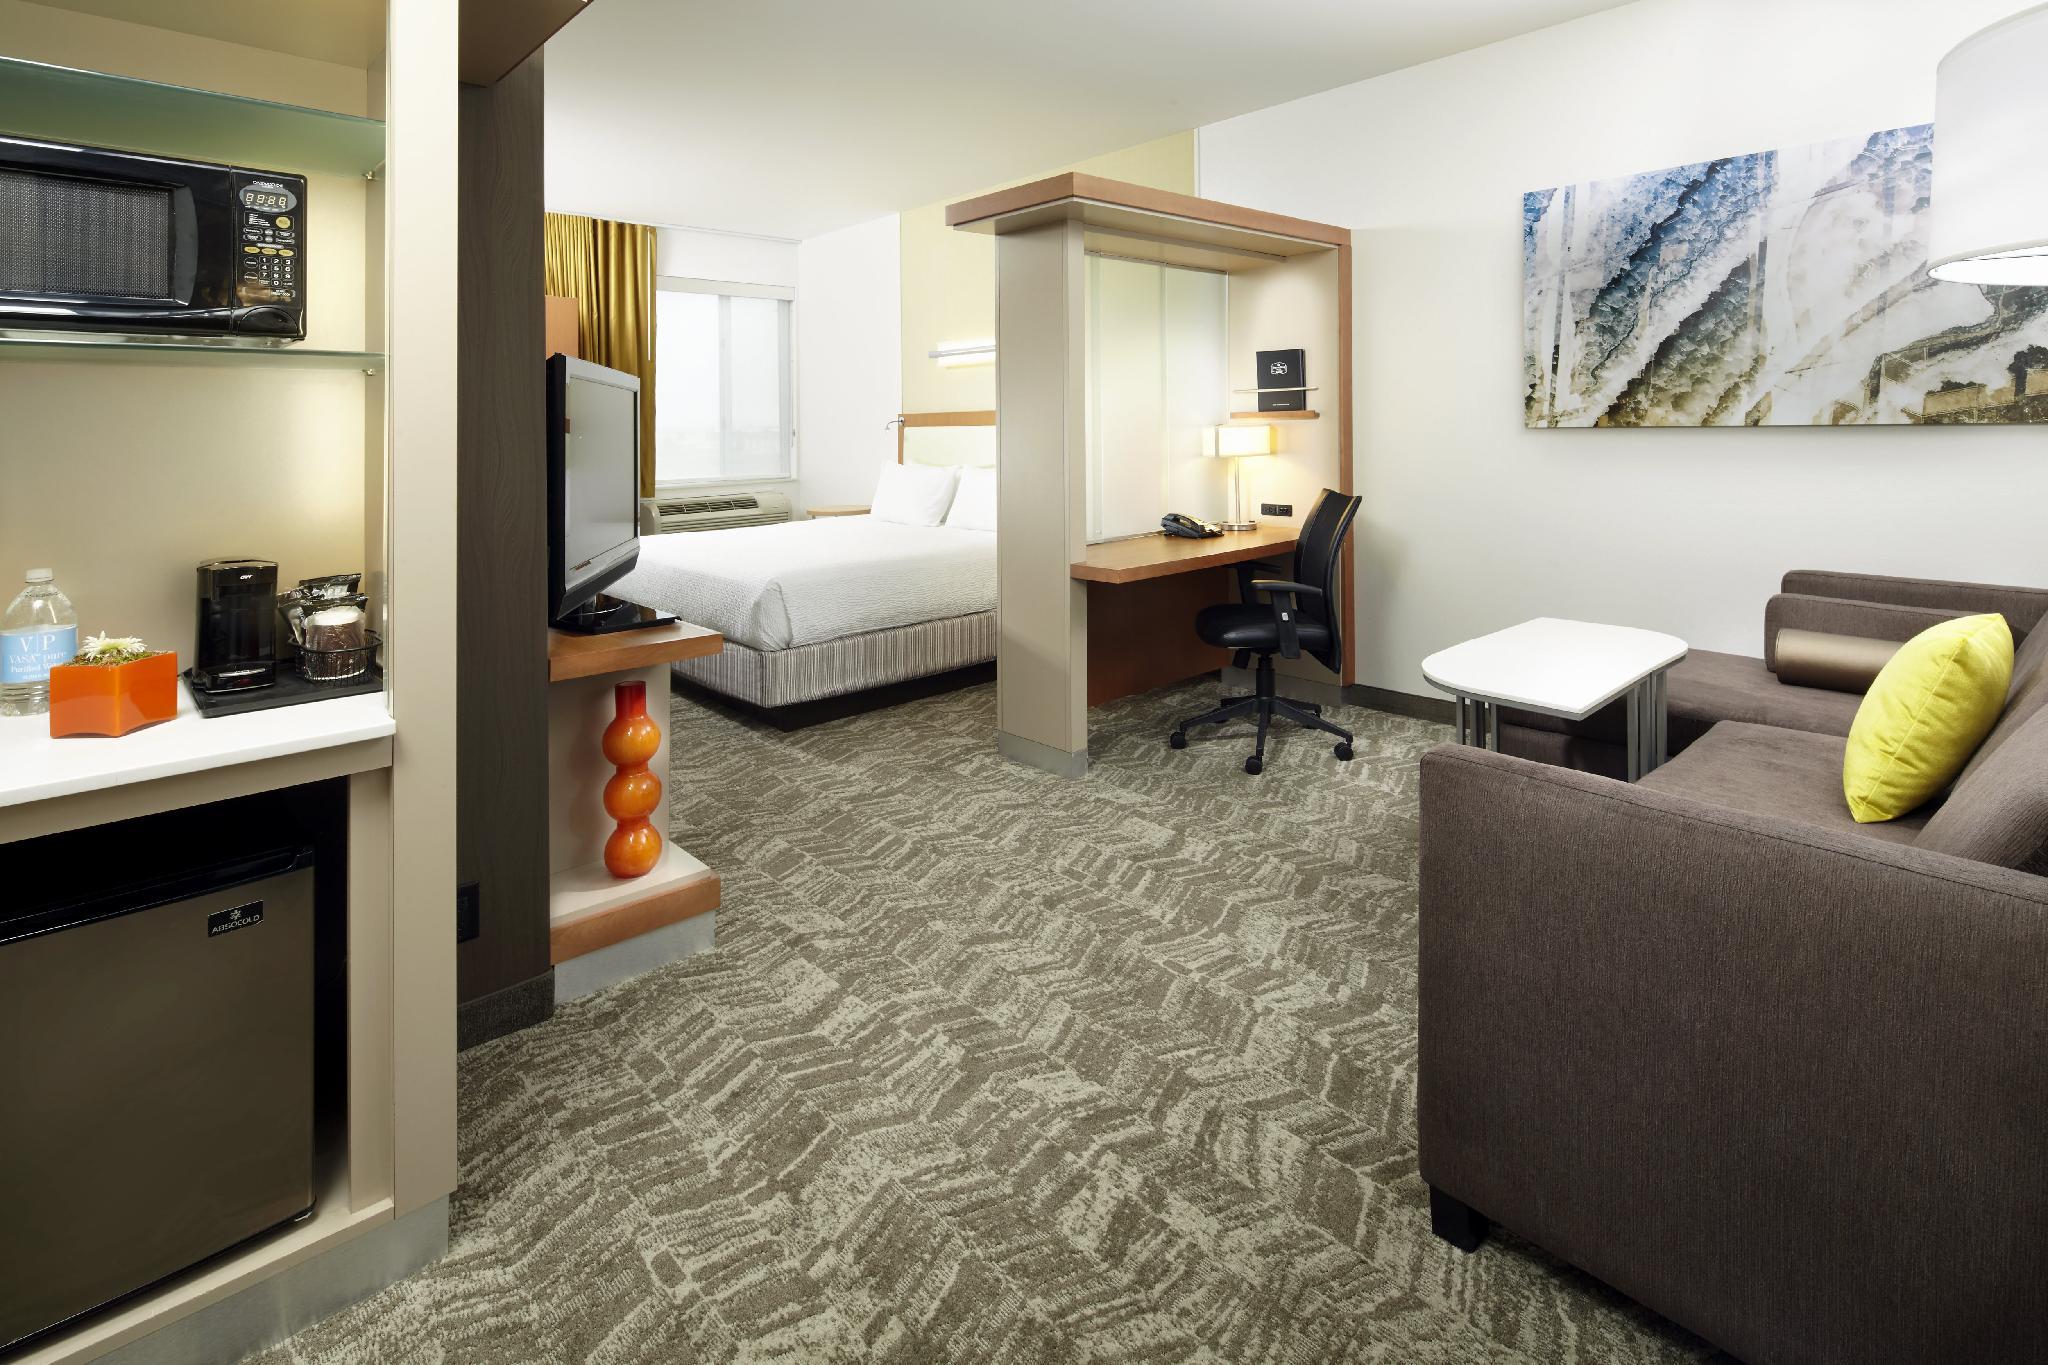 SpringHill Suites by Marriott Waukegan/Guree